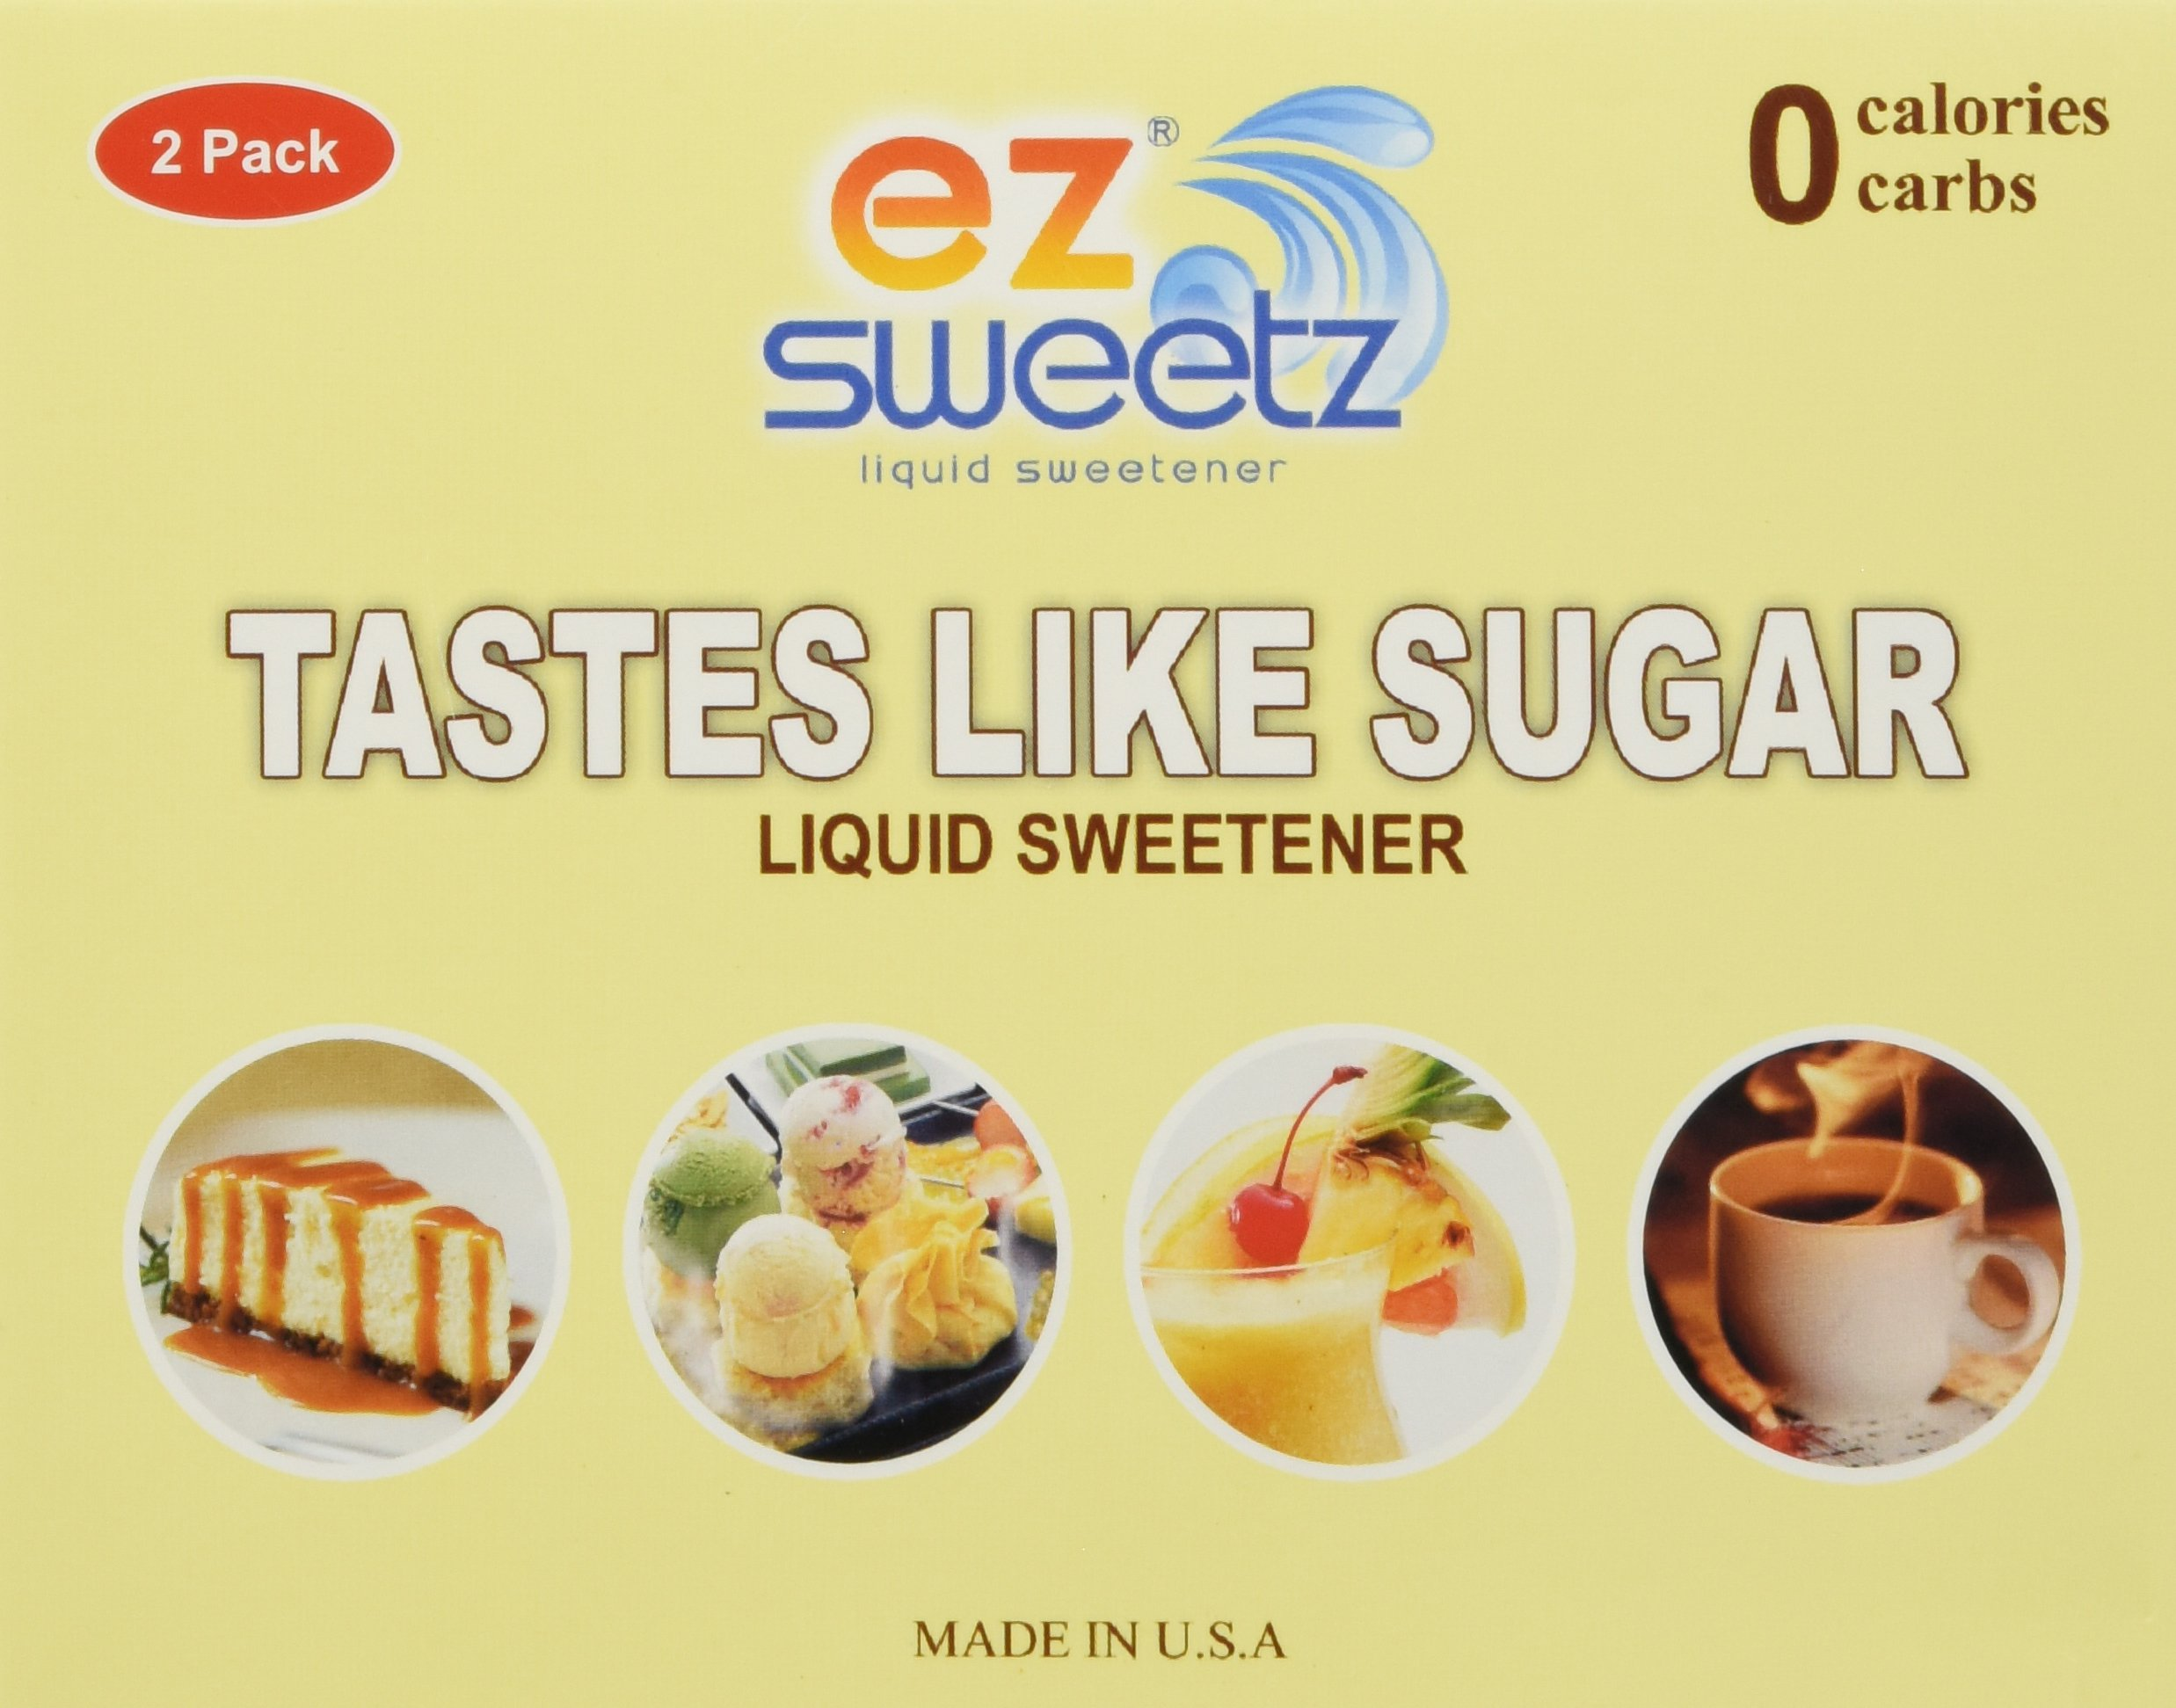 EZ-Sweetz (2 Pack 1.05oz - Liquid Sweetener 400 Servings/Bottle) by EZ-Sweetz